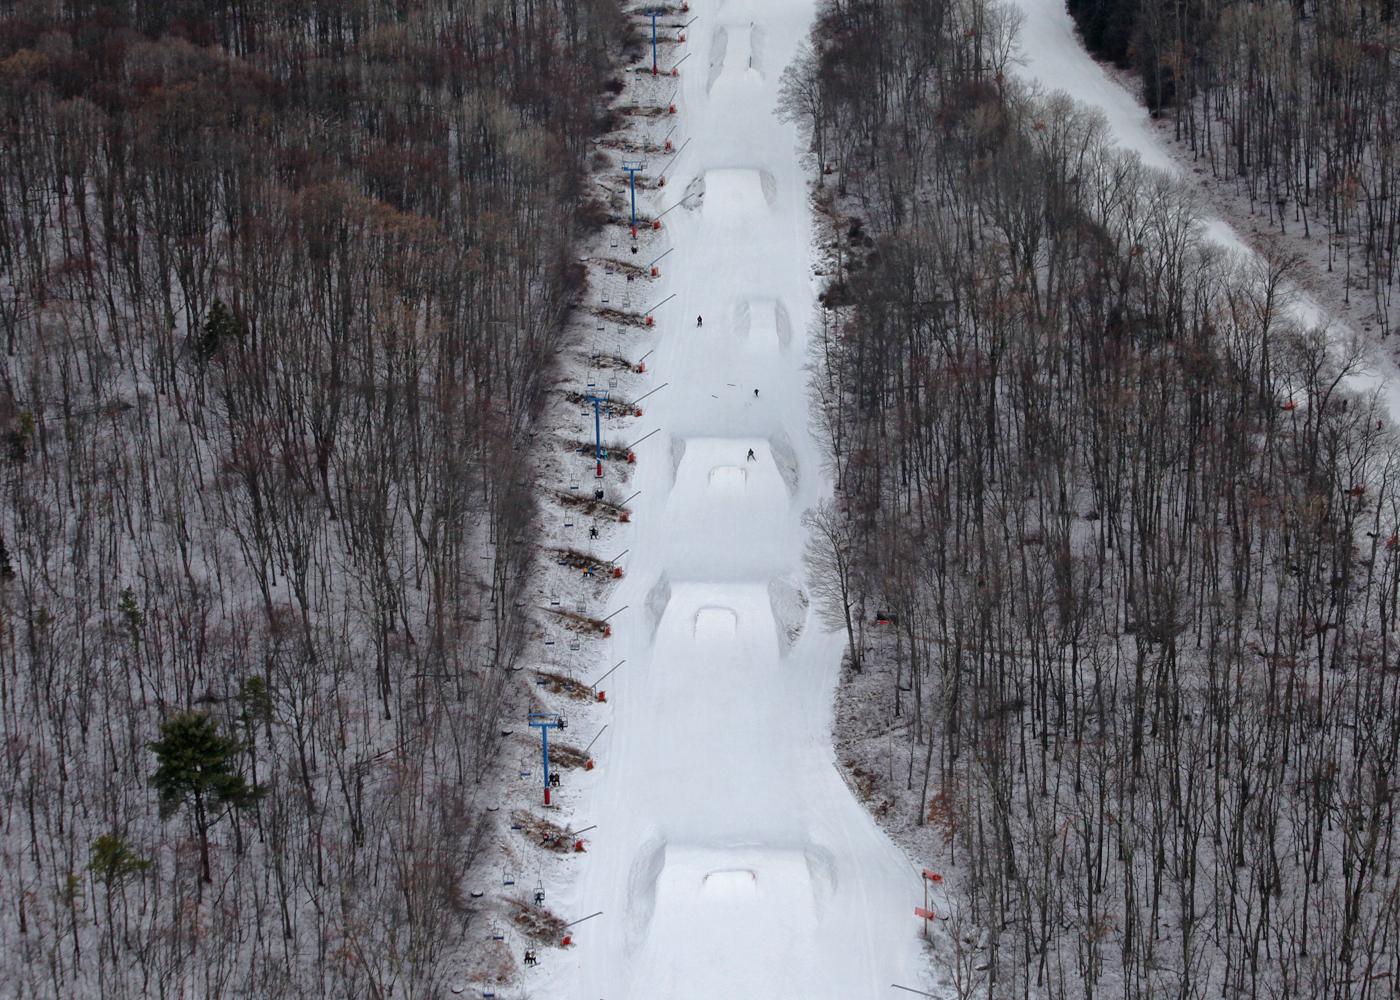 shawnee mountain ski area - snowboarding   east stroudsburg, pa 18301